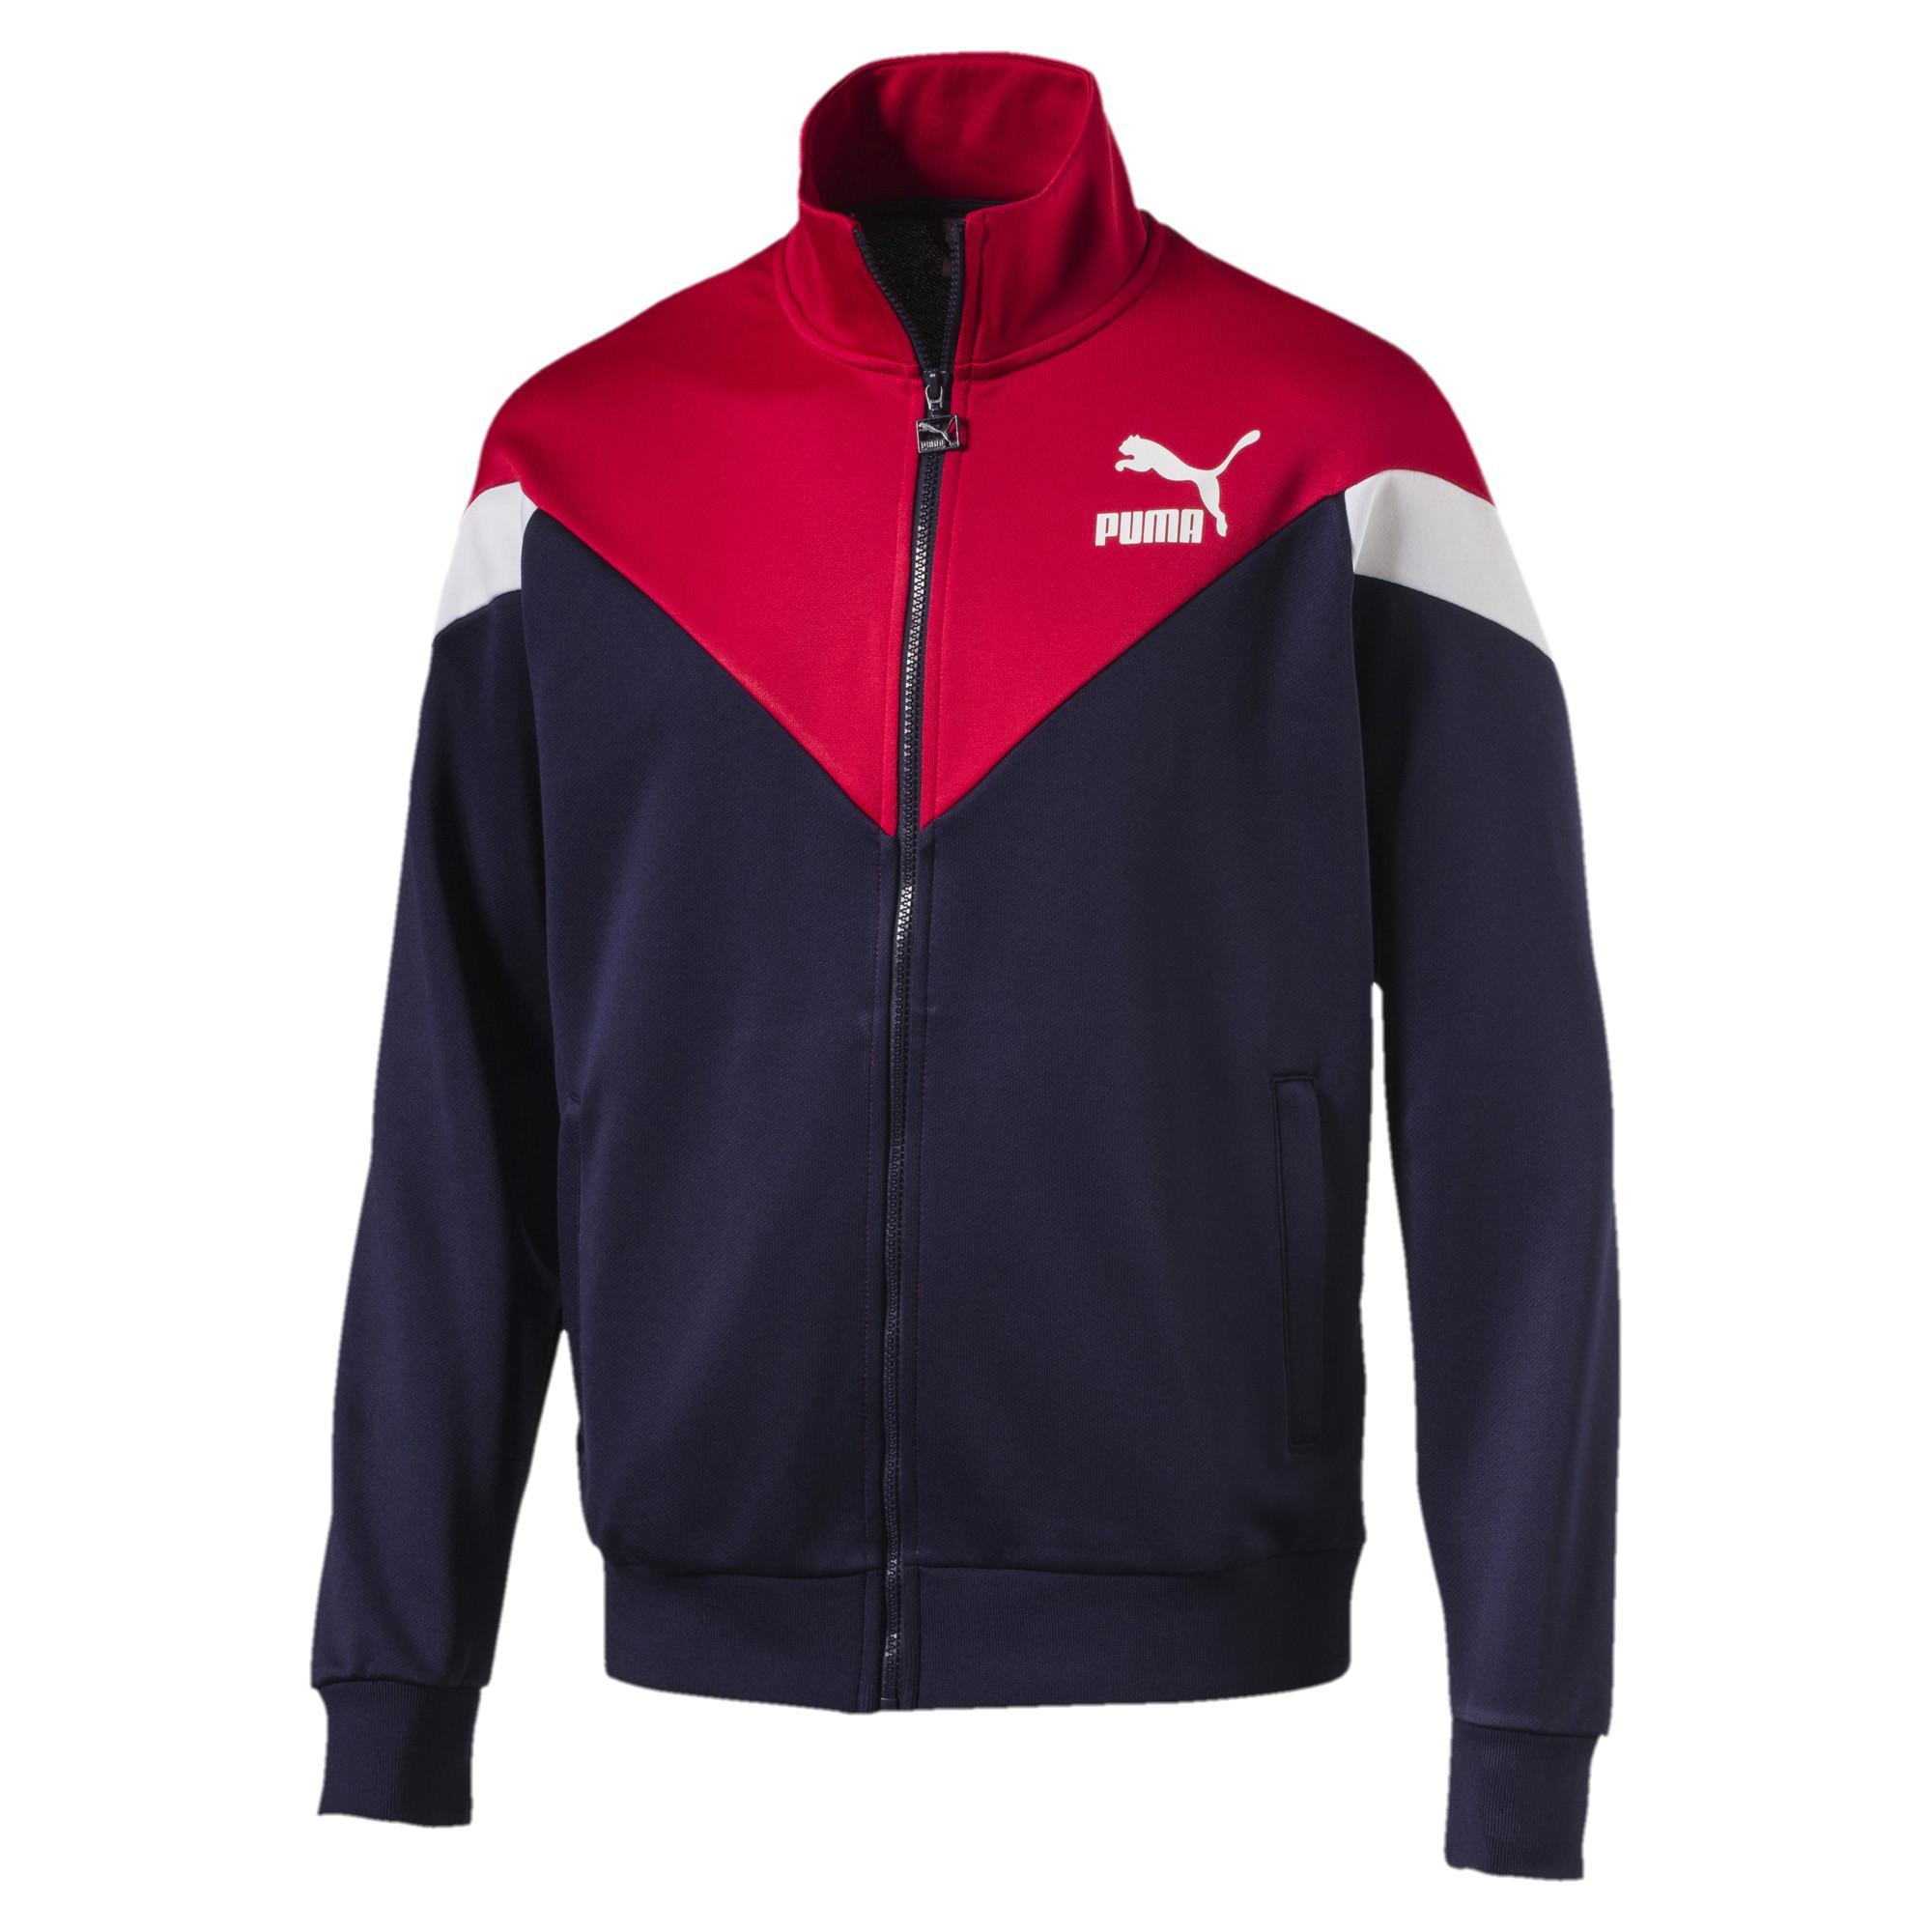 Puma Sweatshirt Mcs Track